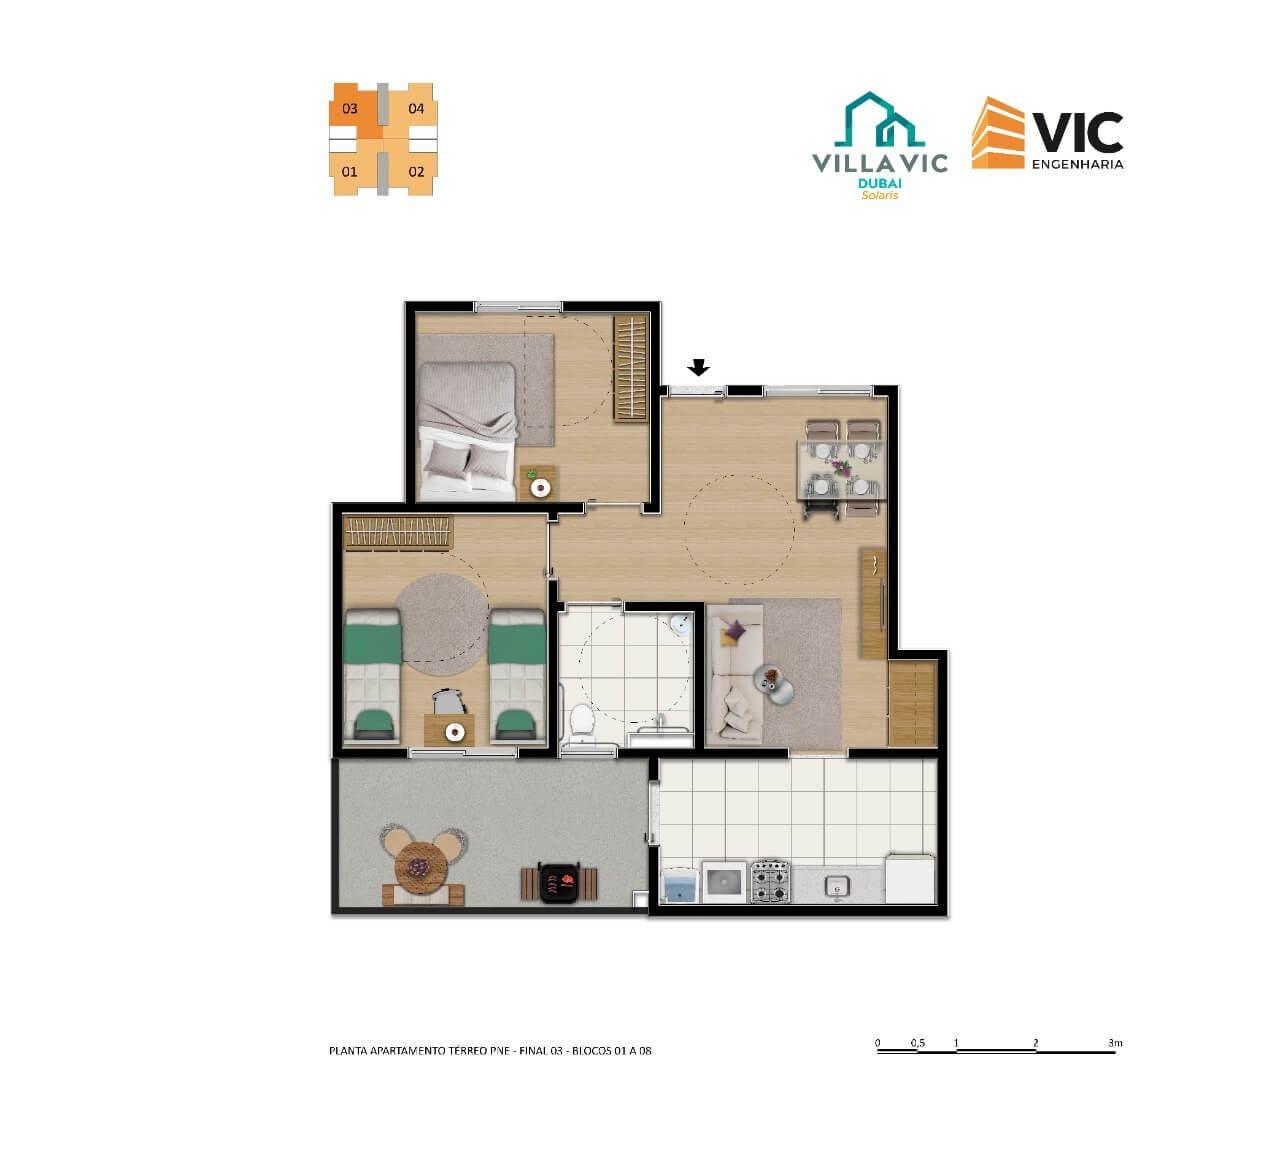 vic-engenharia-villa-vic-dubai-solaris-apartamento-terreo-pne-bloco-1-a-8-final-3 (1)